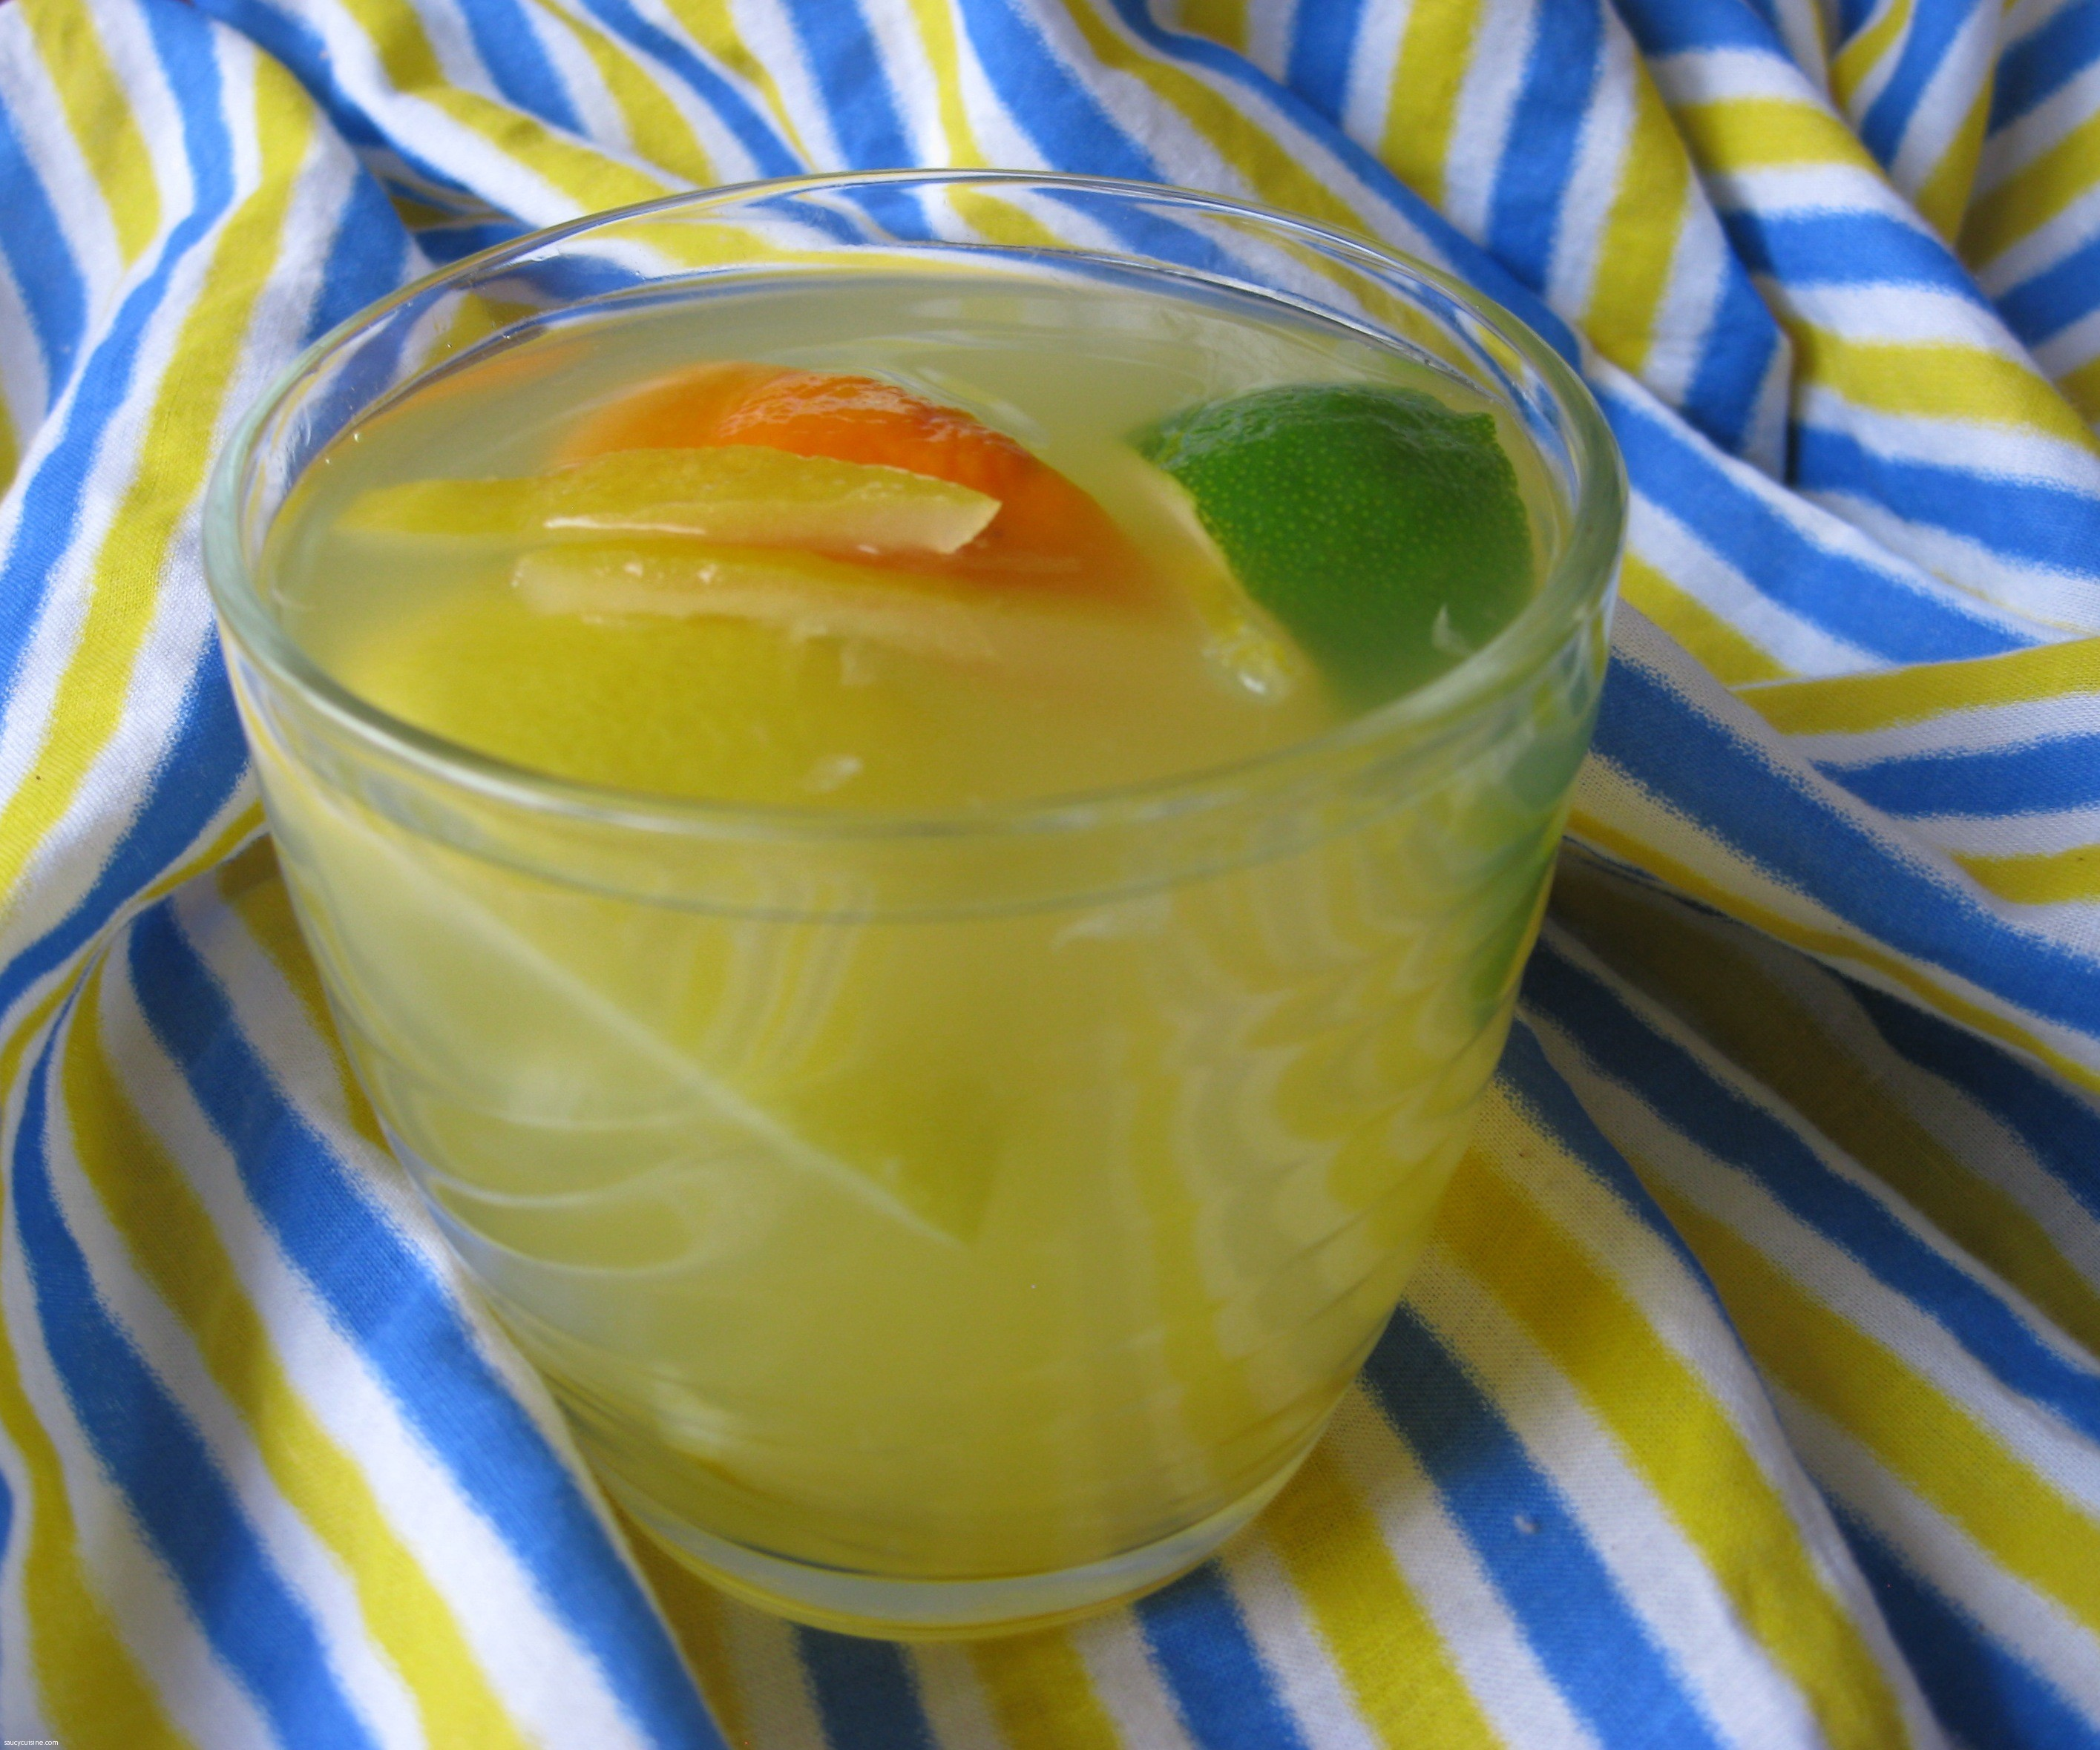 limonada-naranja-limon